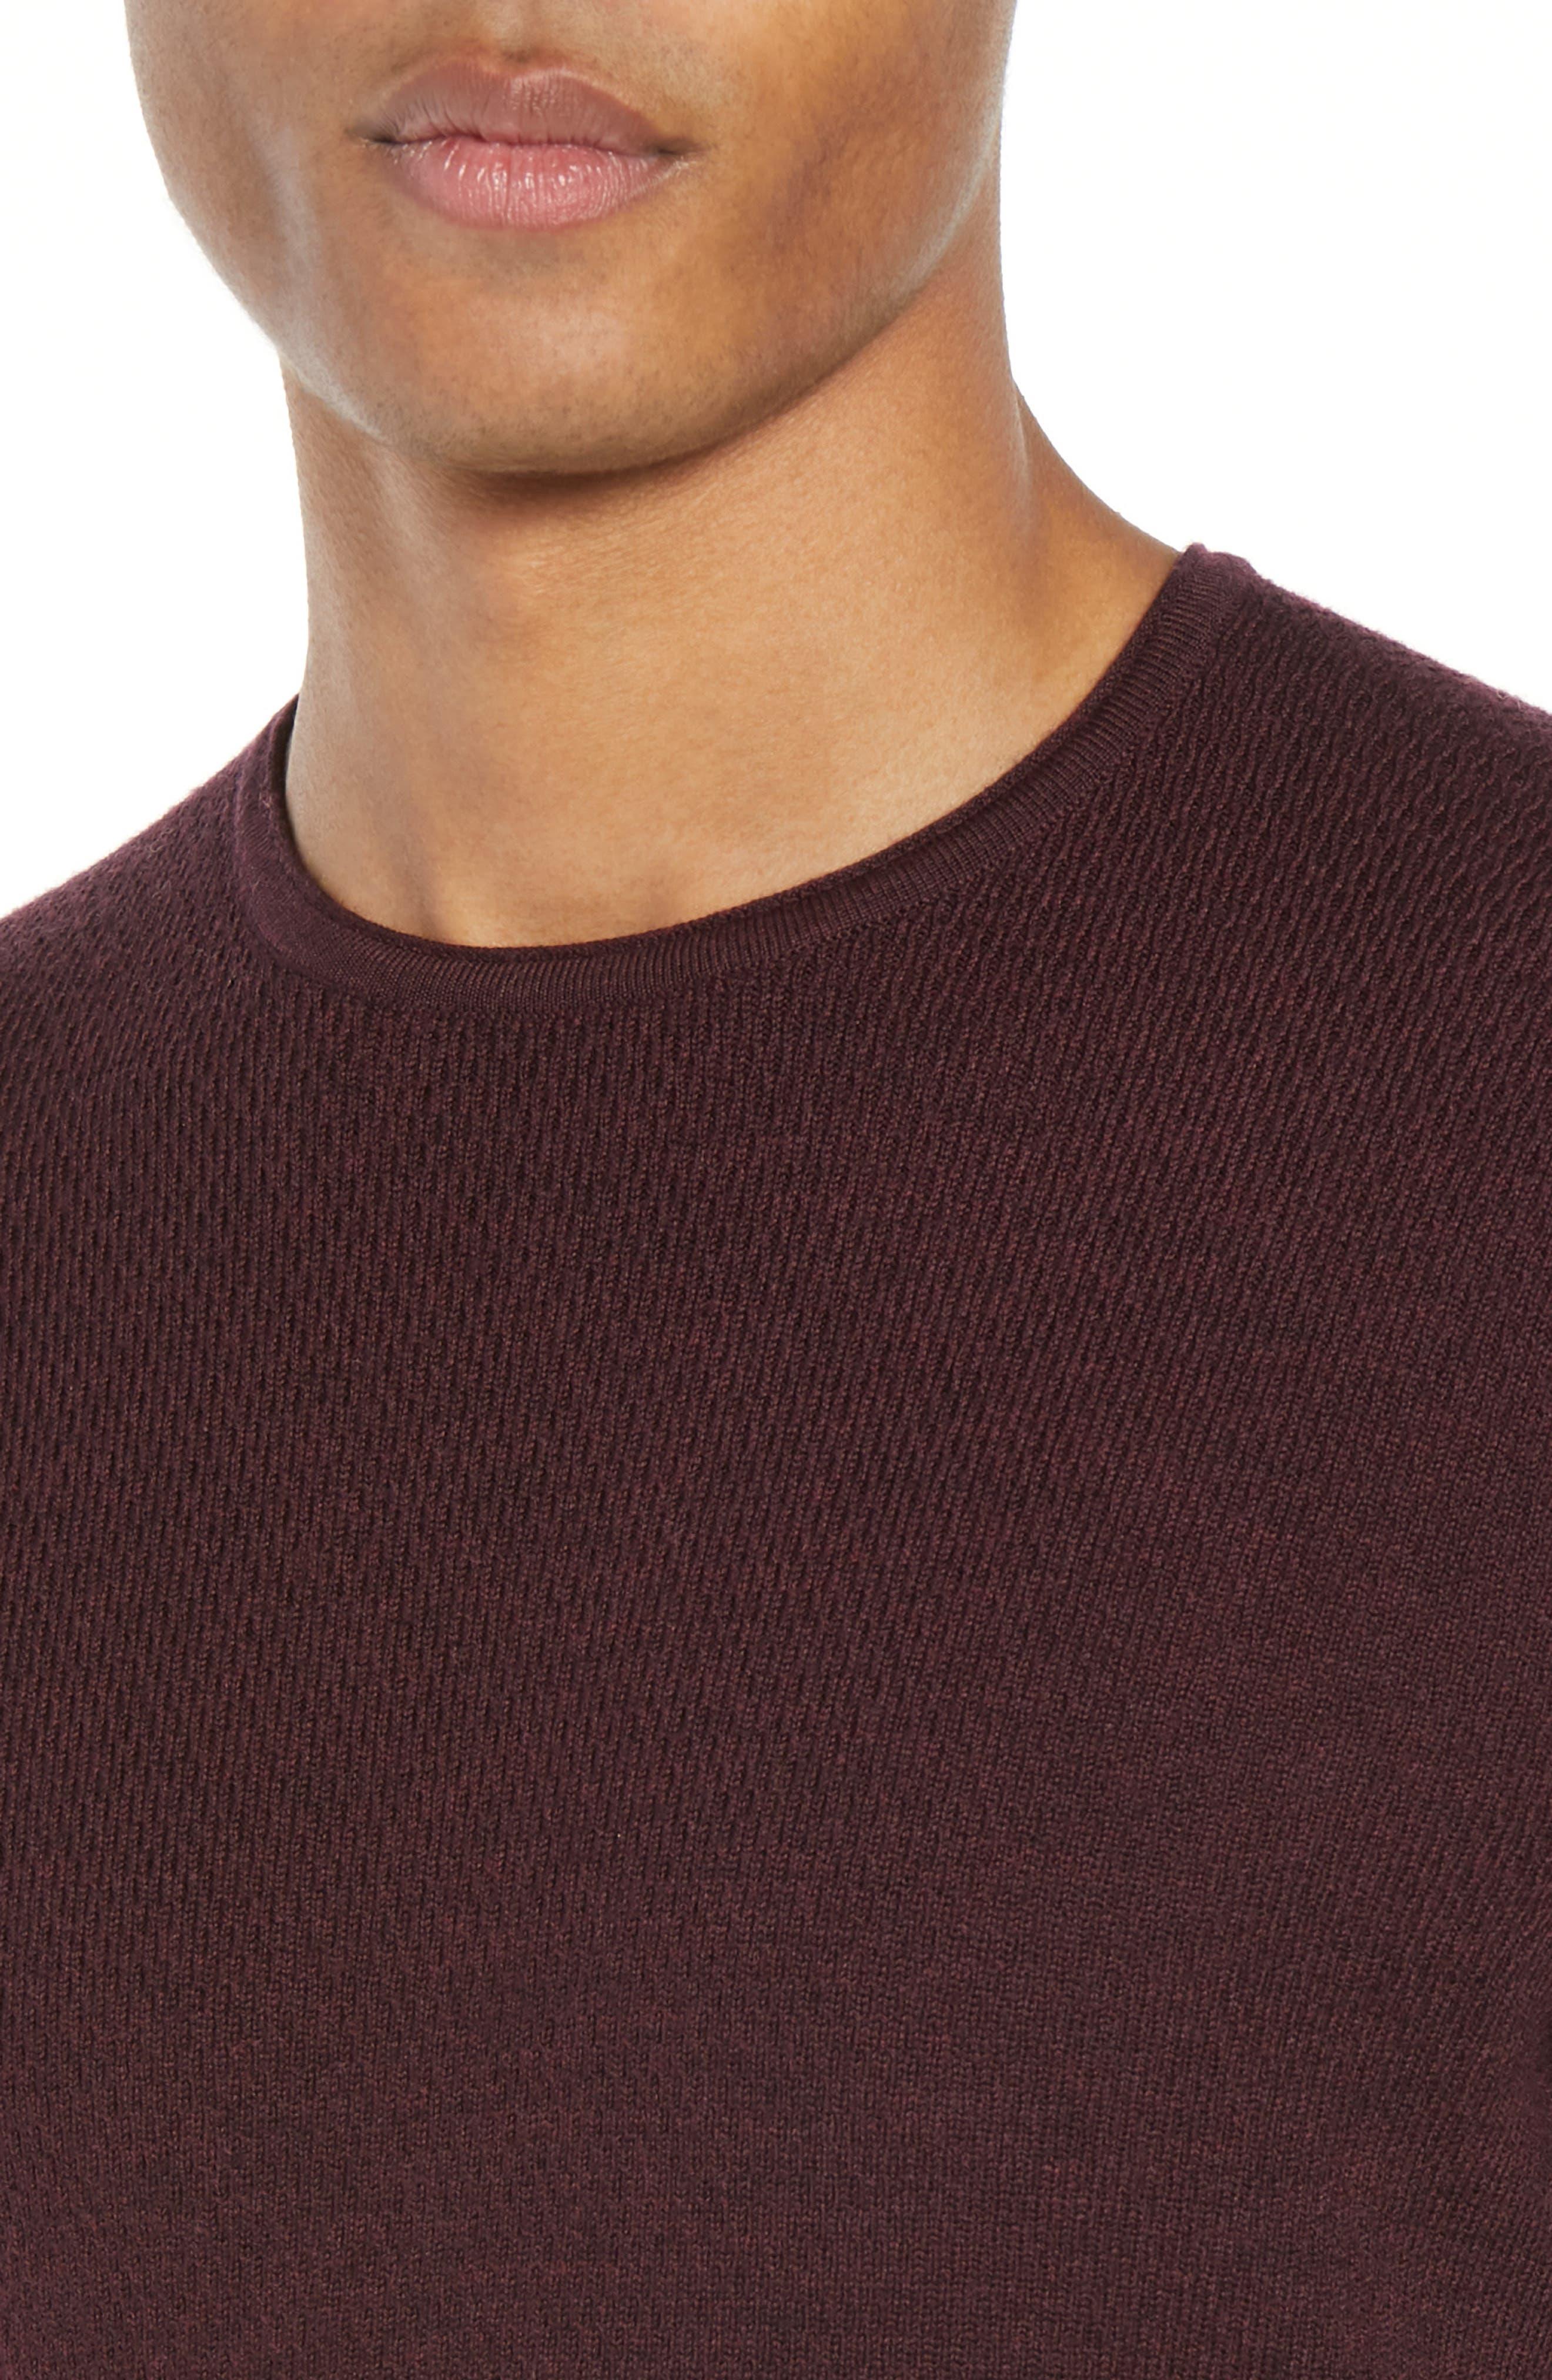 Gregory Merino Wool Blend Crewneck Sweater,                             Alternate thumbnail 4, color,                             BURGUNDY